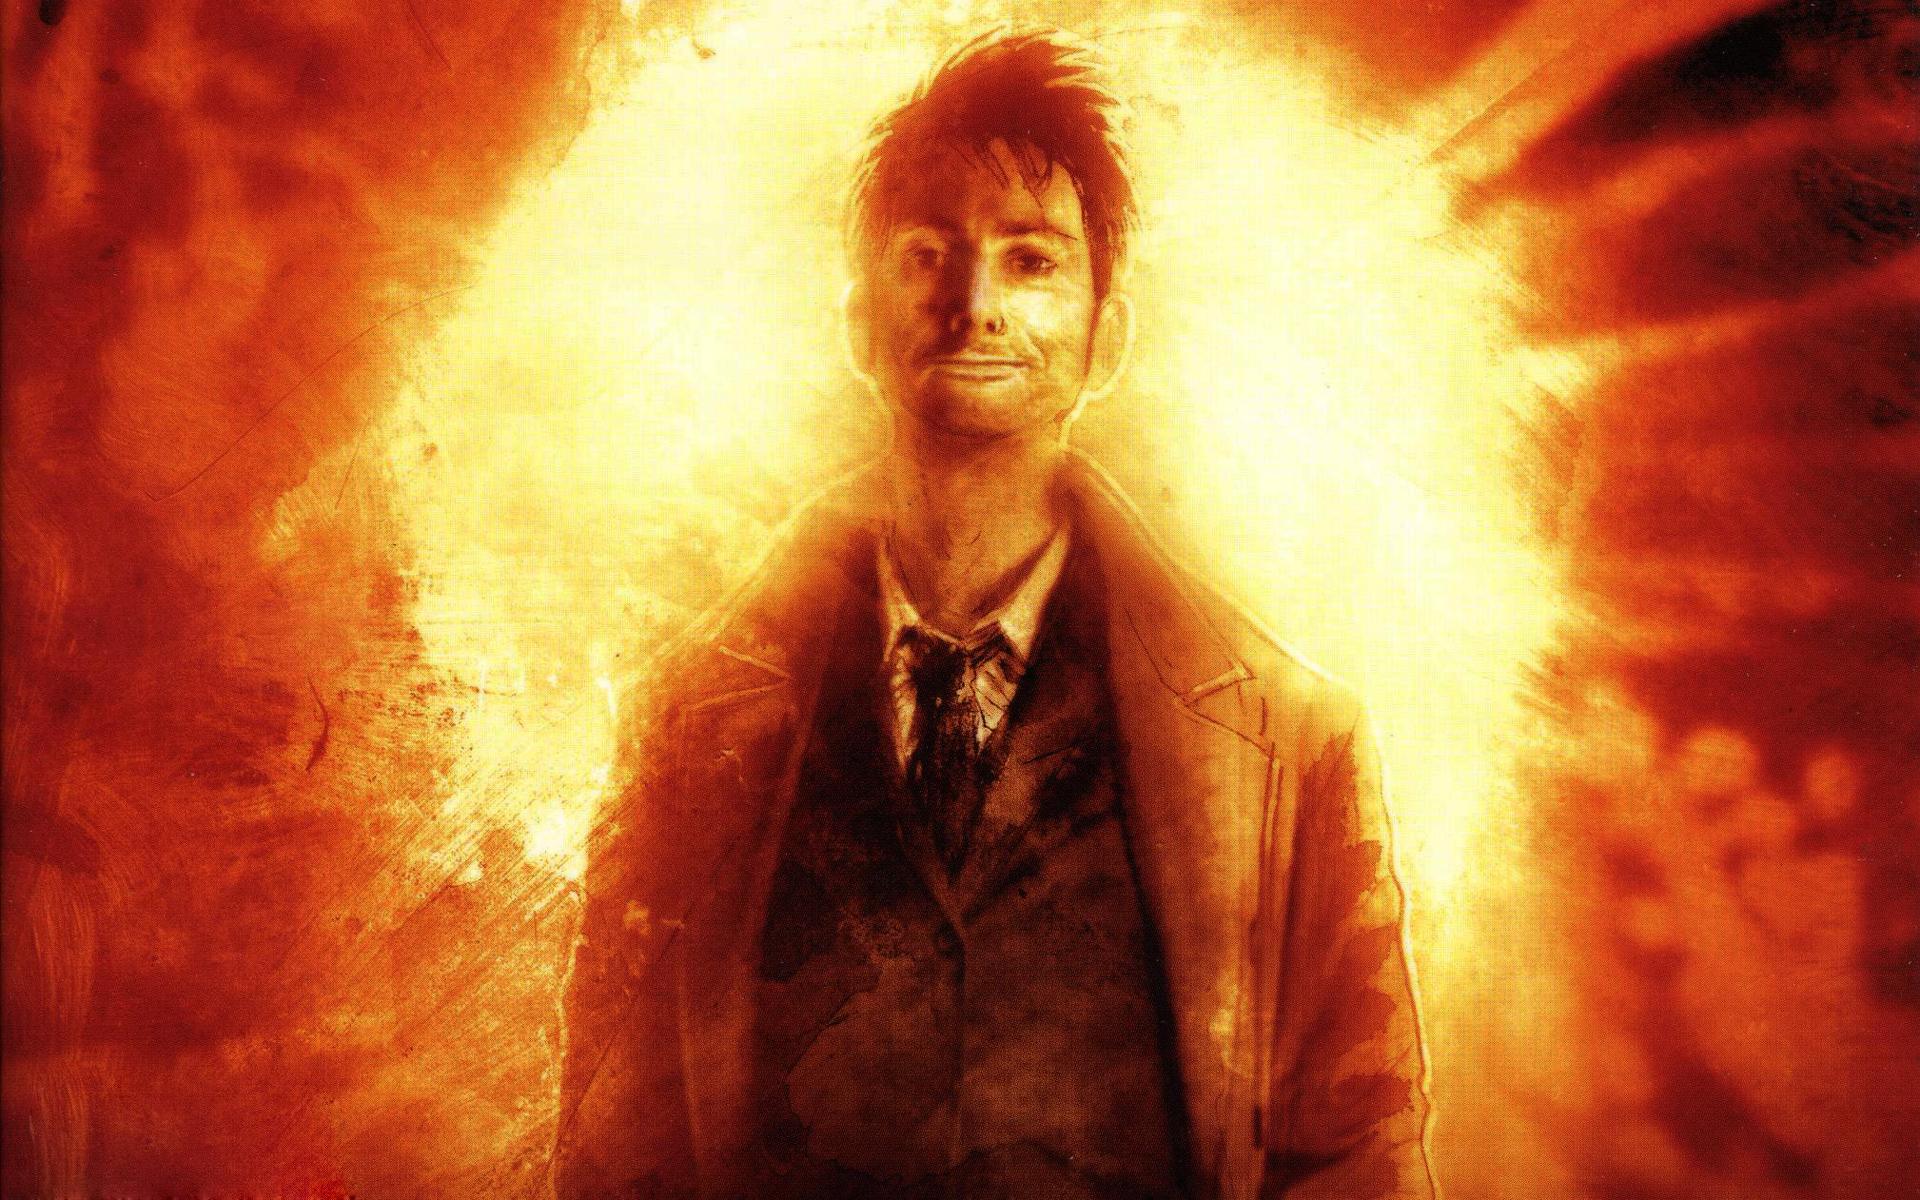 doctor who doctor who wallpaper 21357464 fanpop